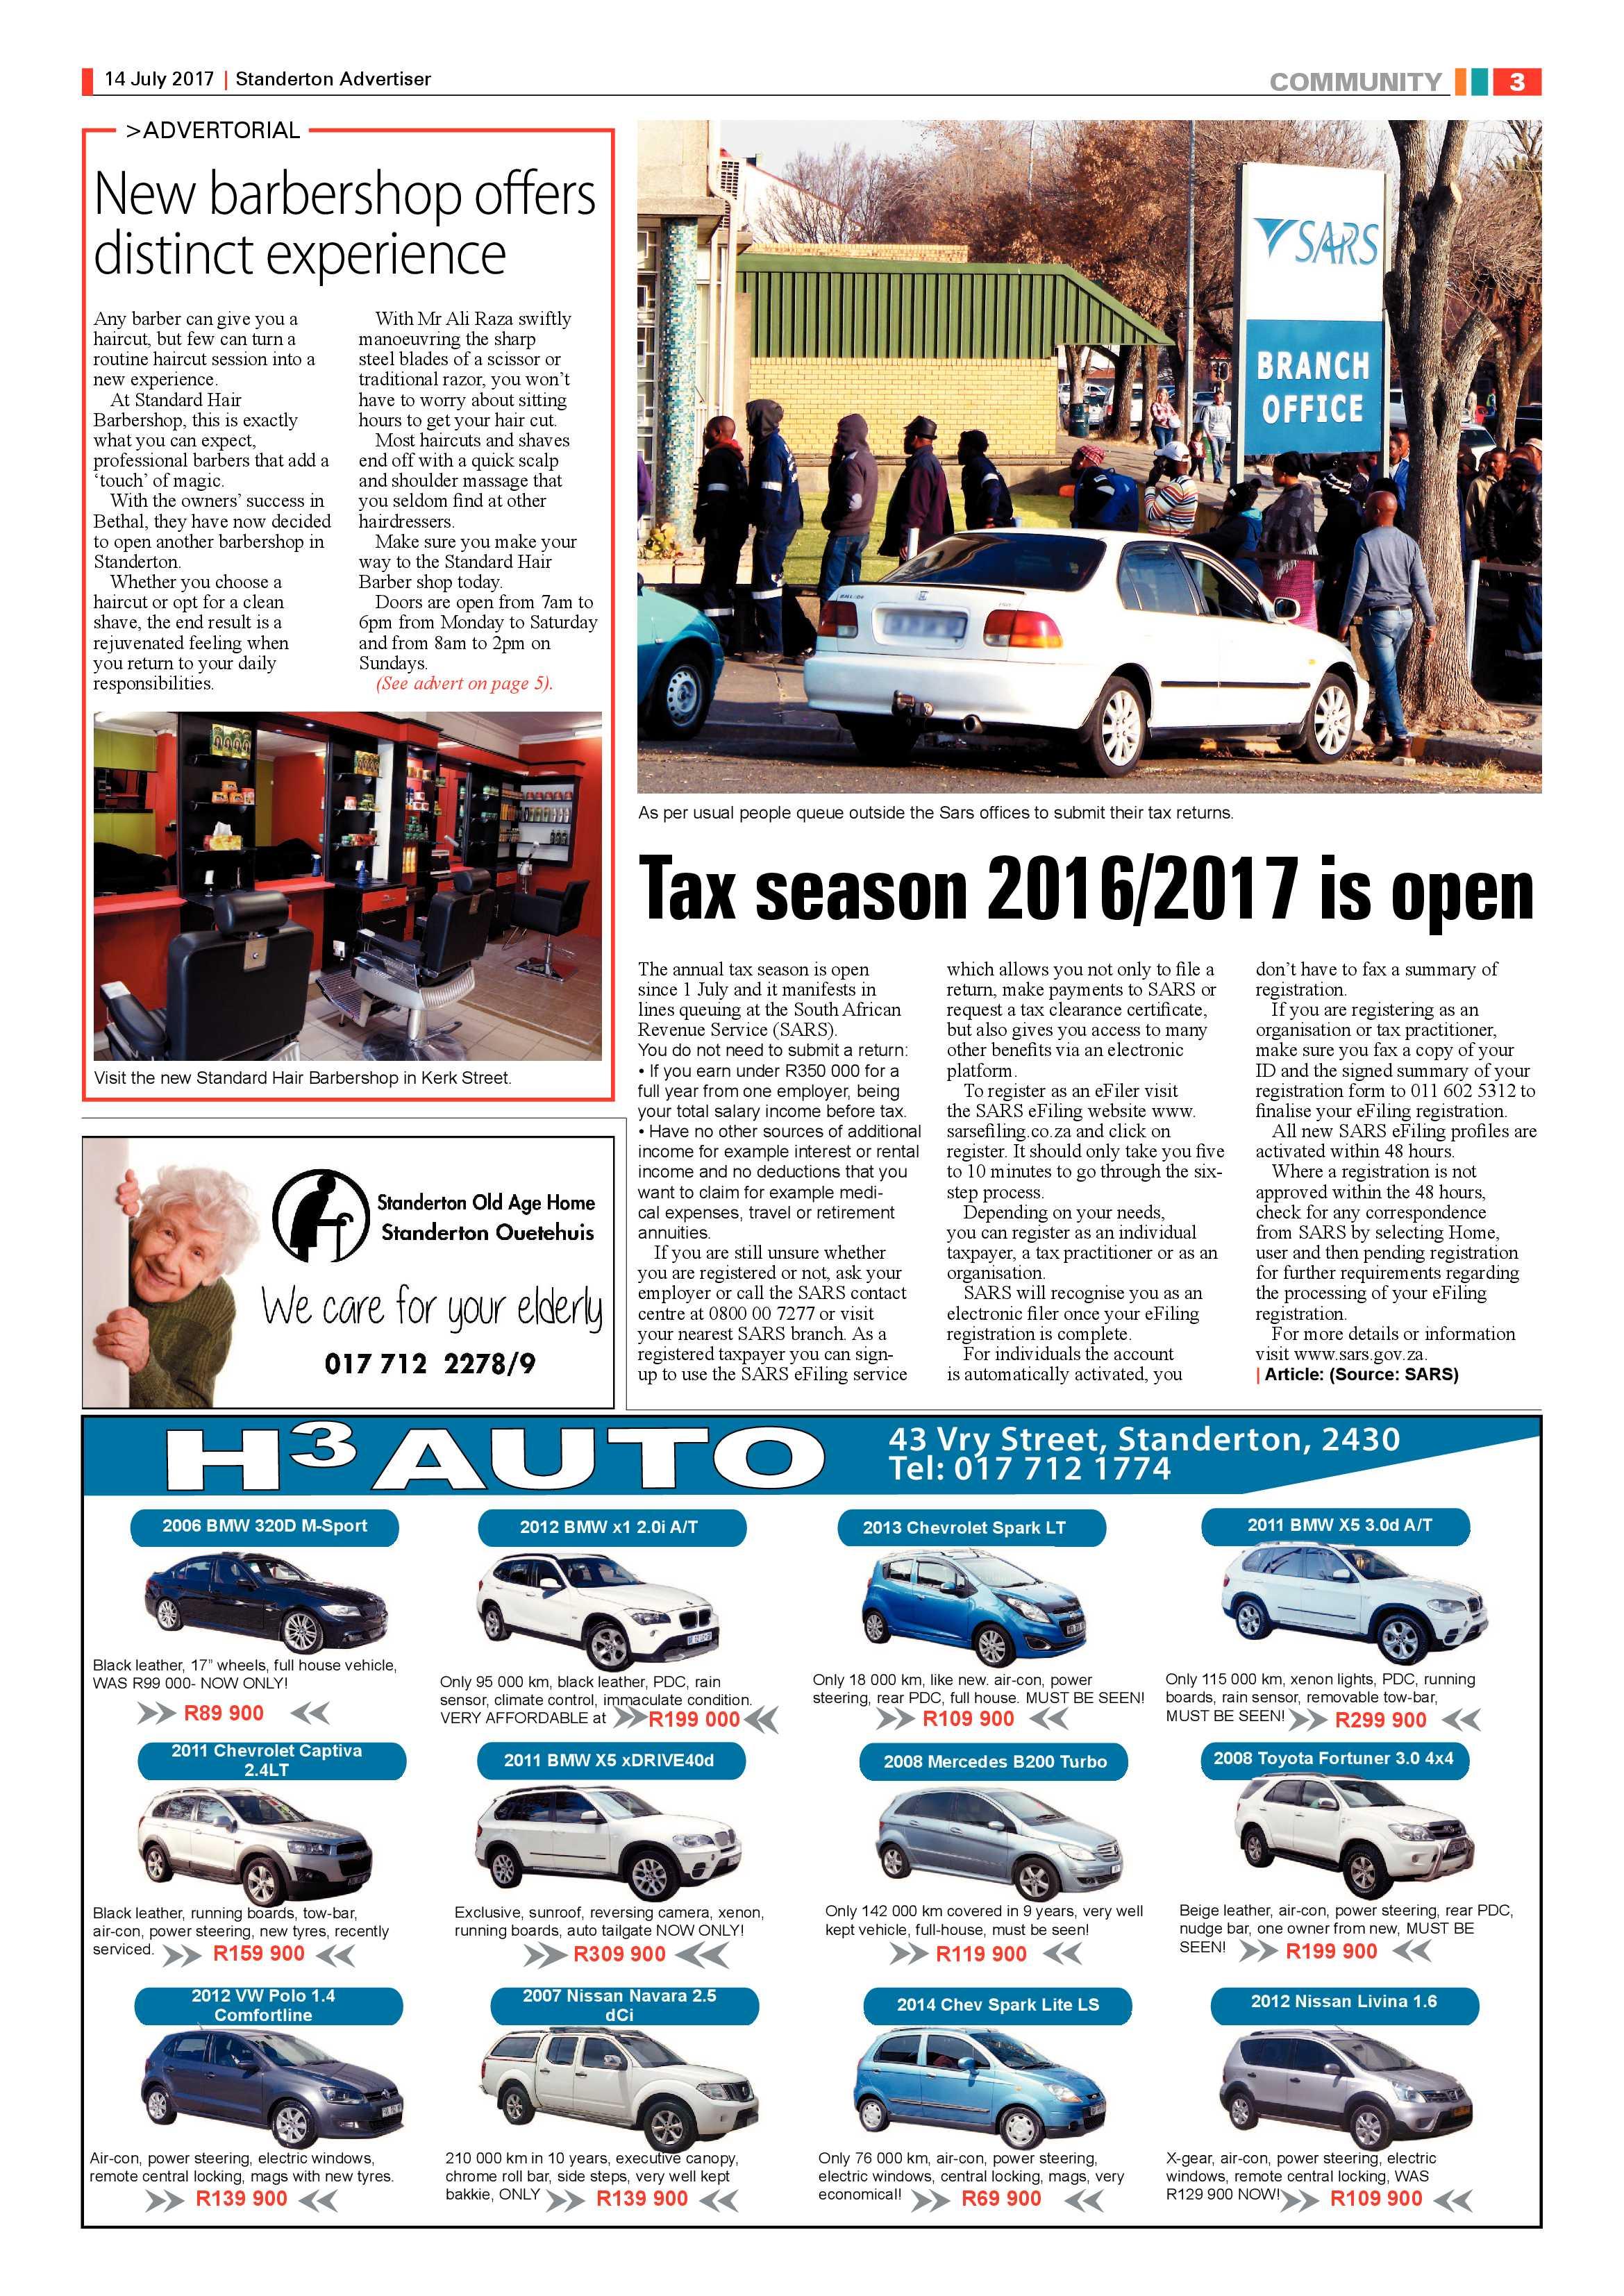 standerton-advertiser-14-july-2017-epapers-page-3